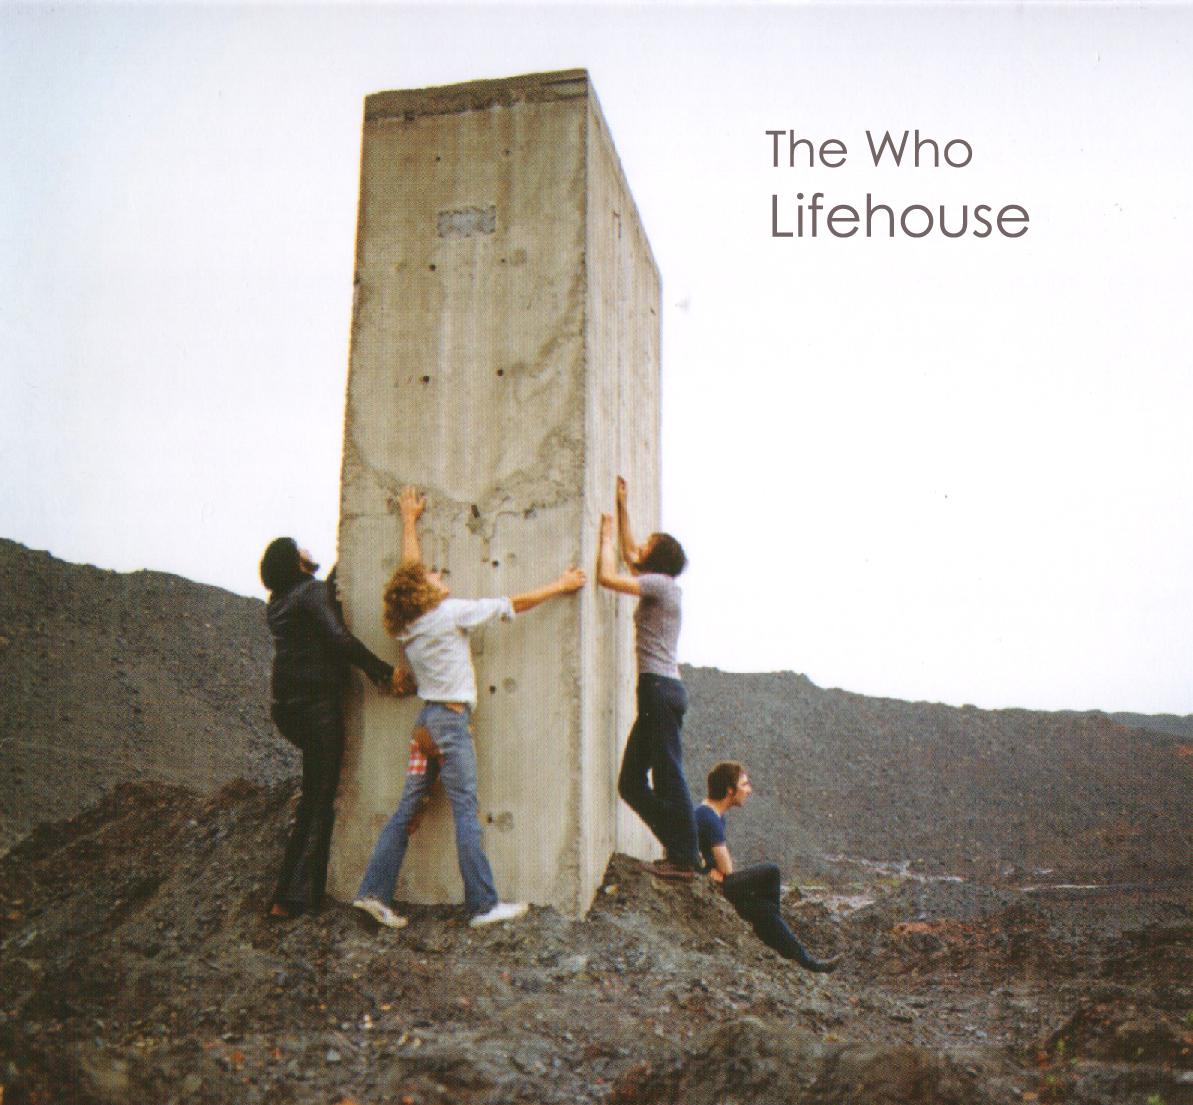 the-who-lifehouse